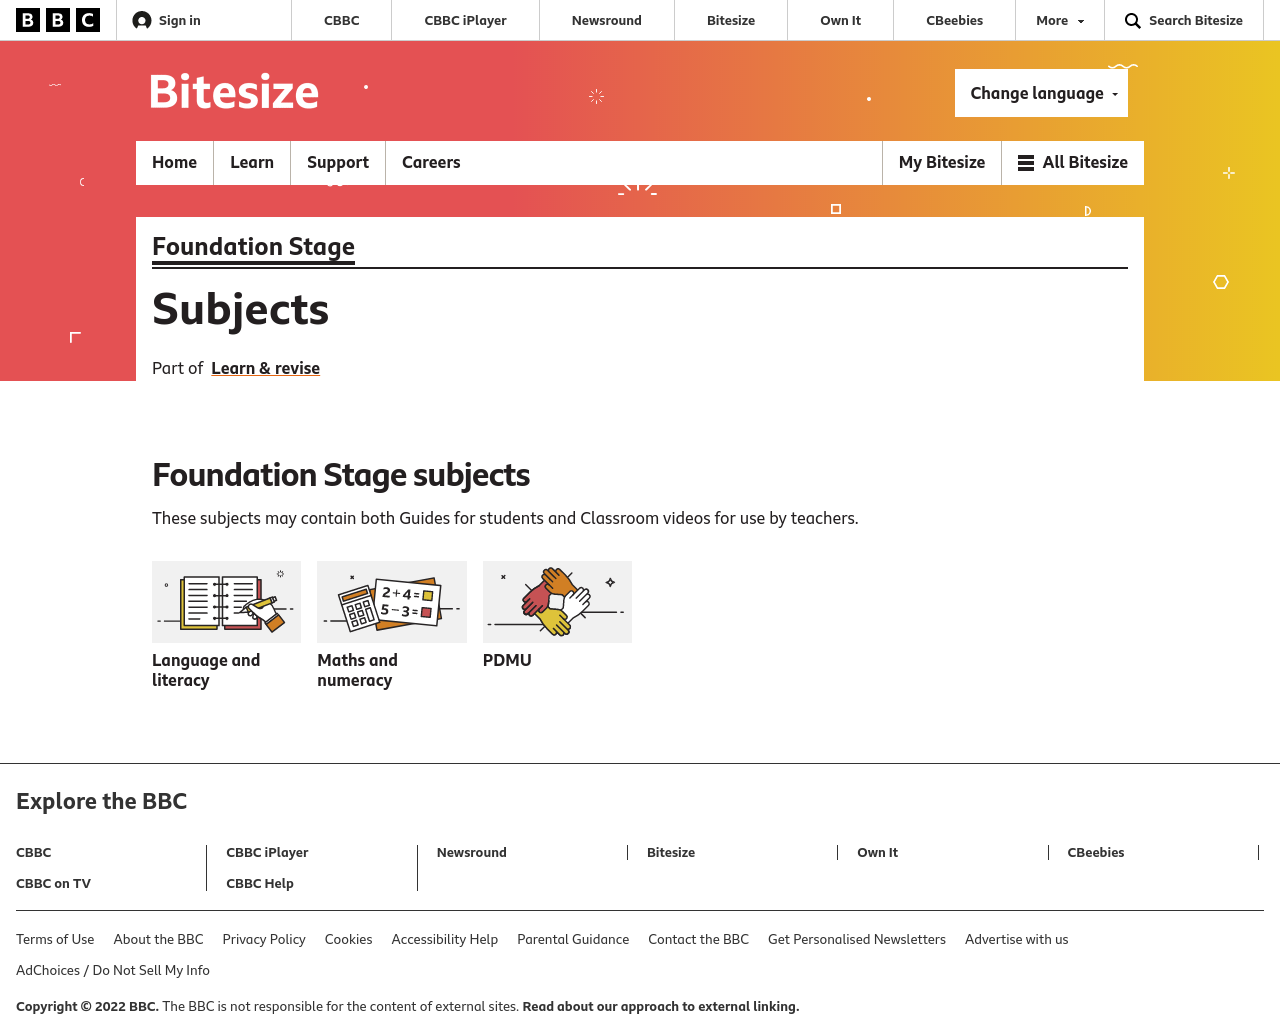 BBC Foundation Stage website